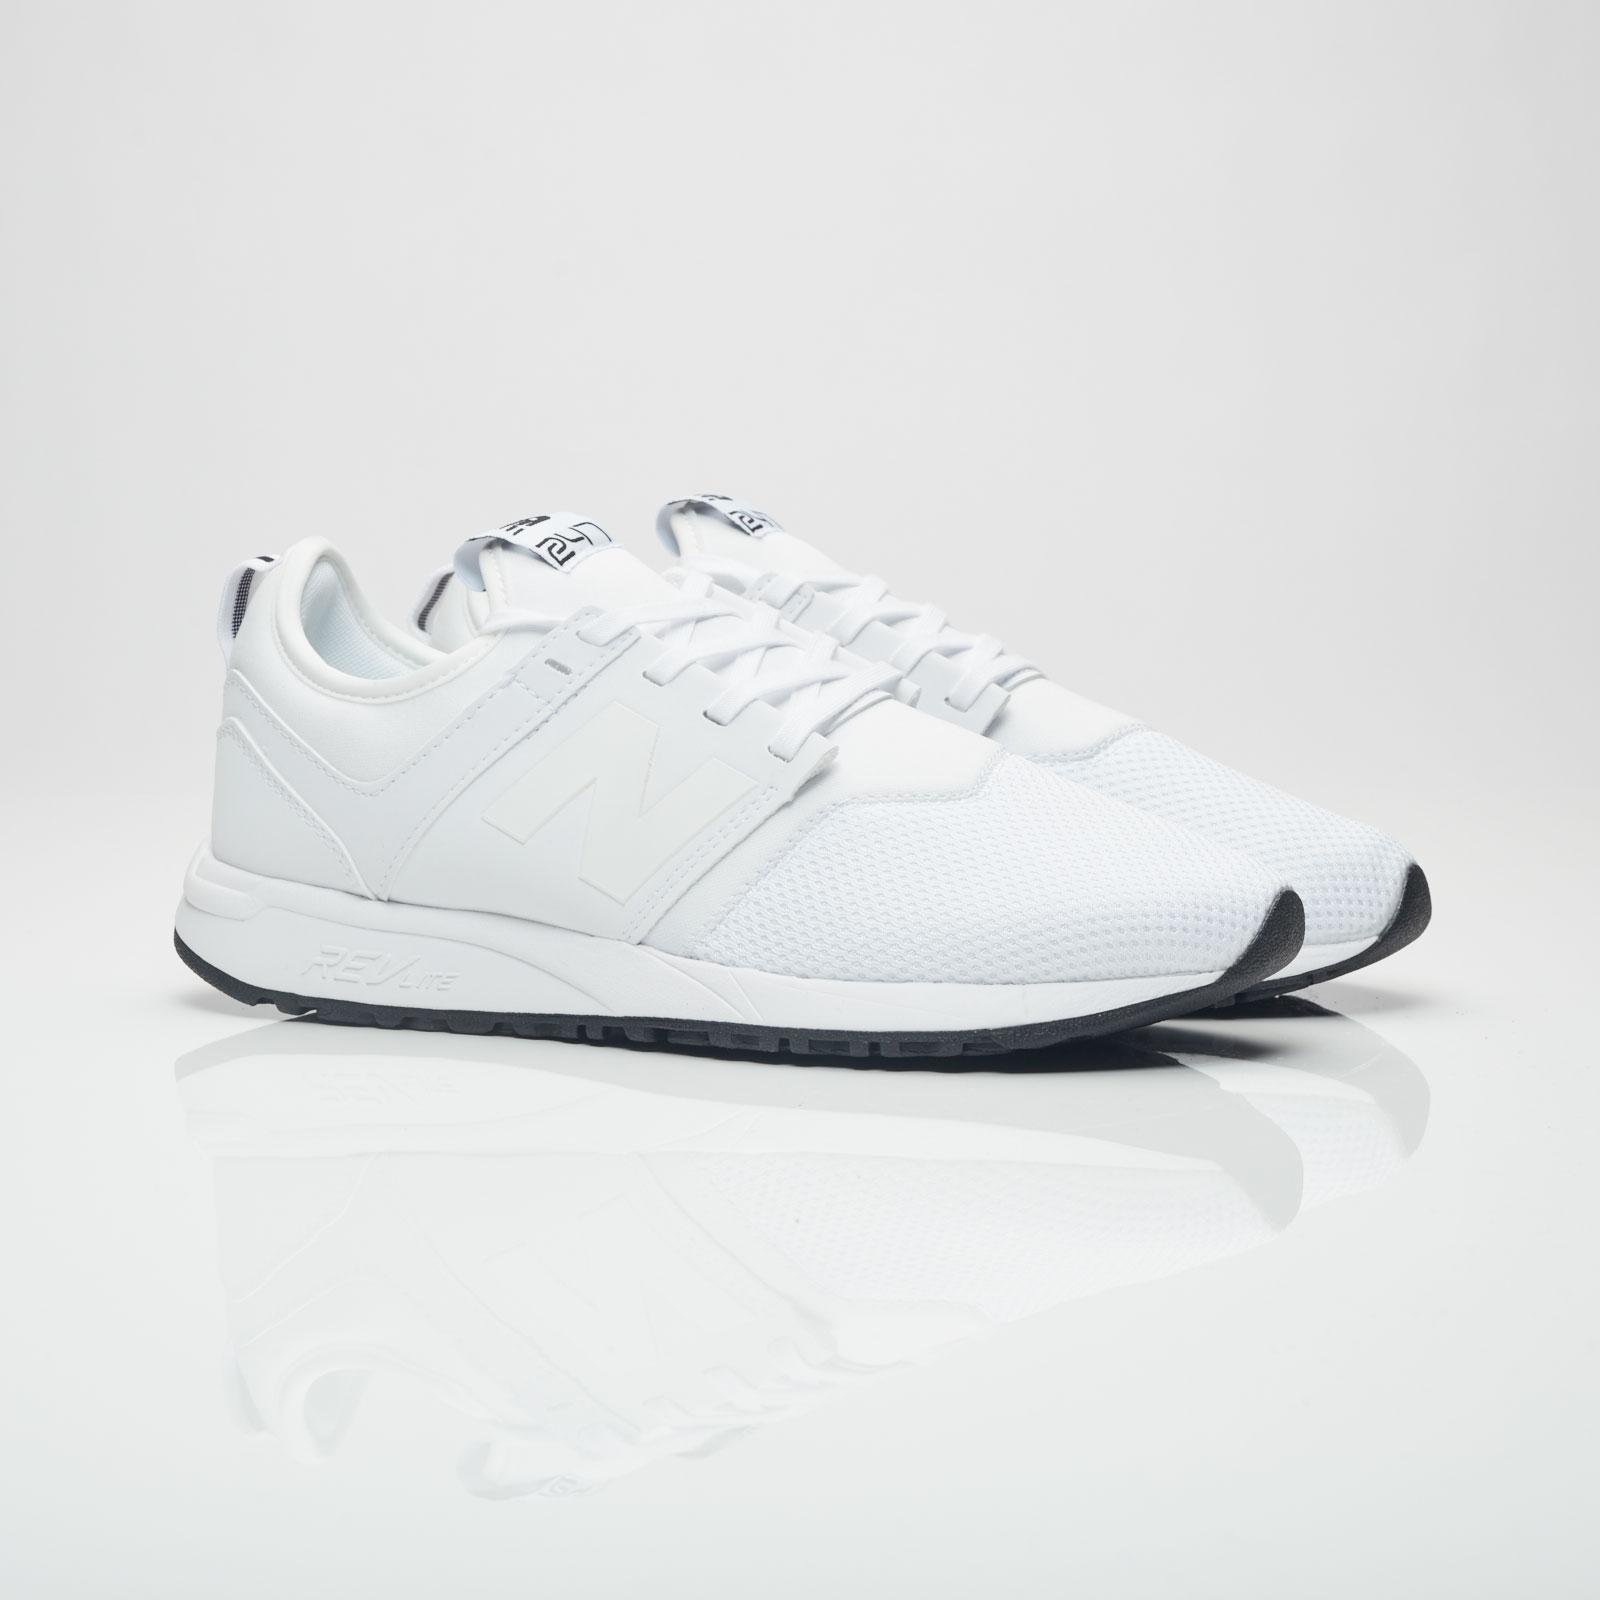 New Balance Wrl247 - Wrl247fb - SNS | sneakers & streetwear online ...